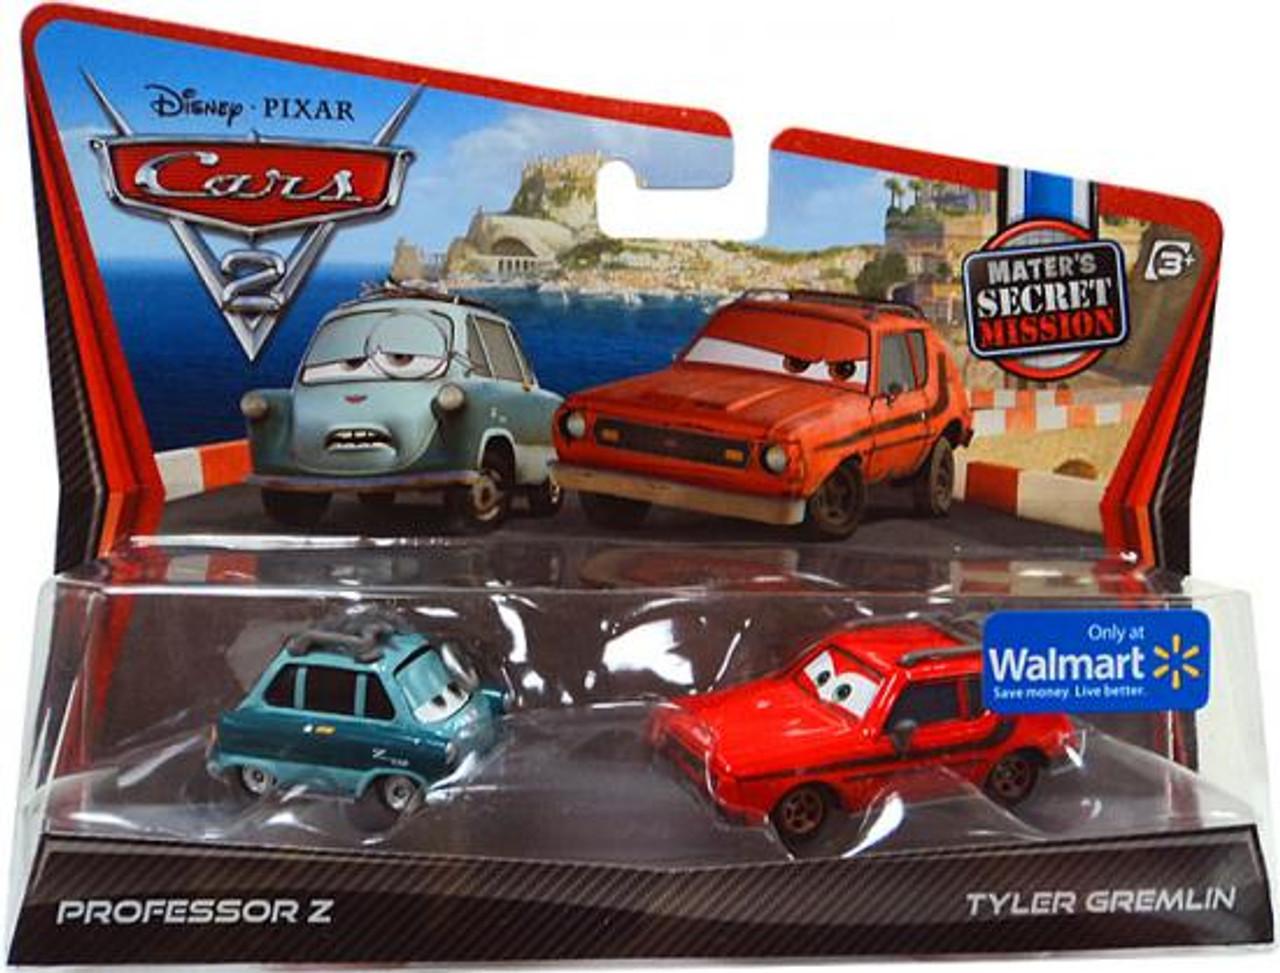 Disney Cars Cars 2 Professor Z & Tyler Gremlin Exclusive Diecast Car 2-Pack